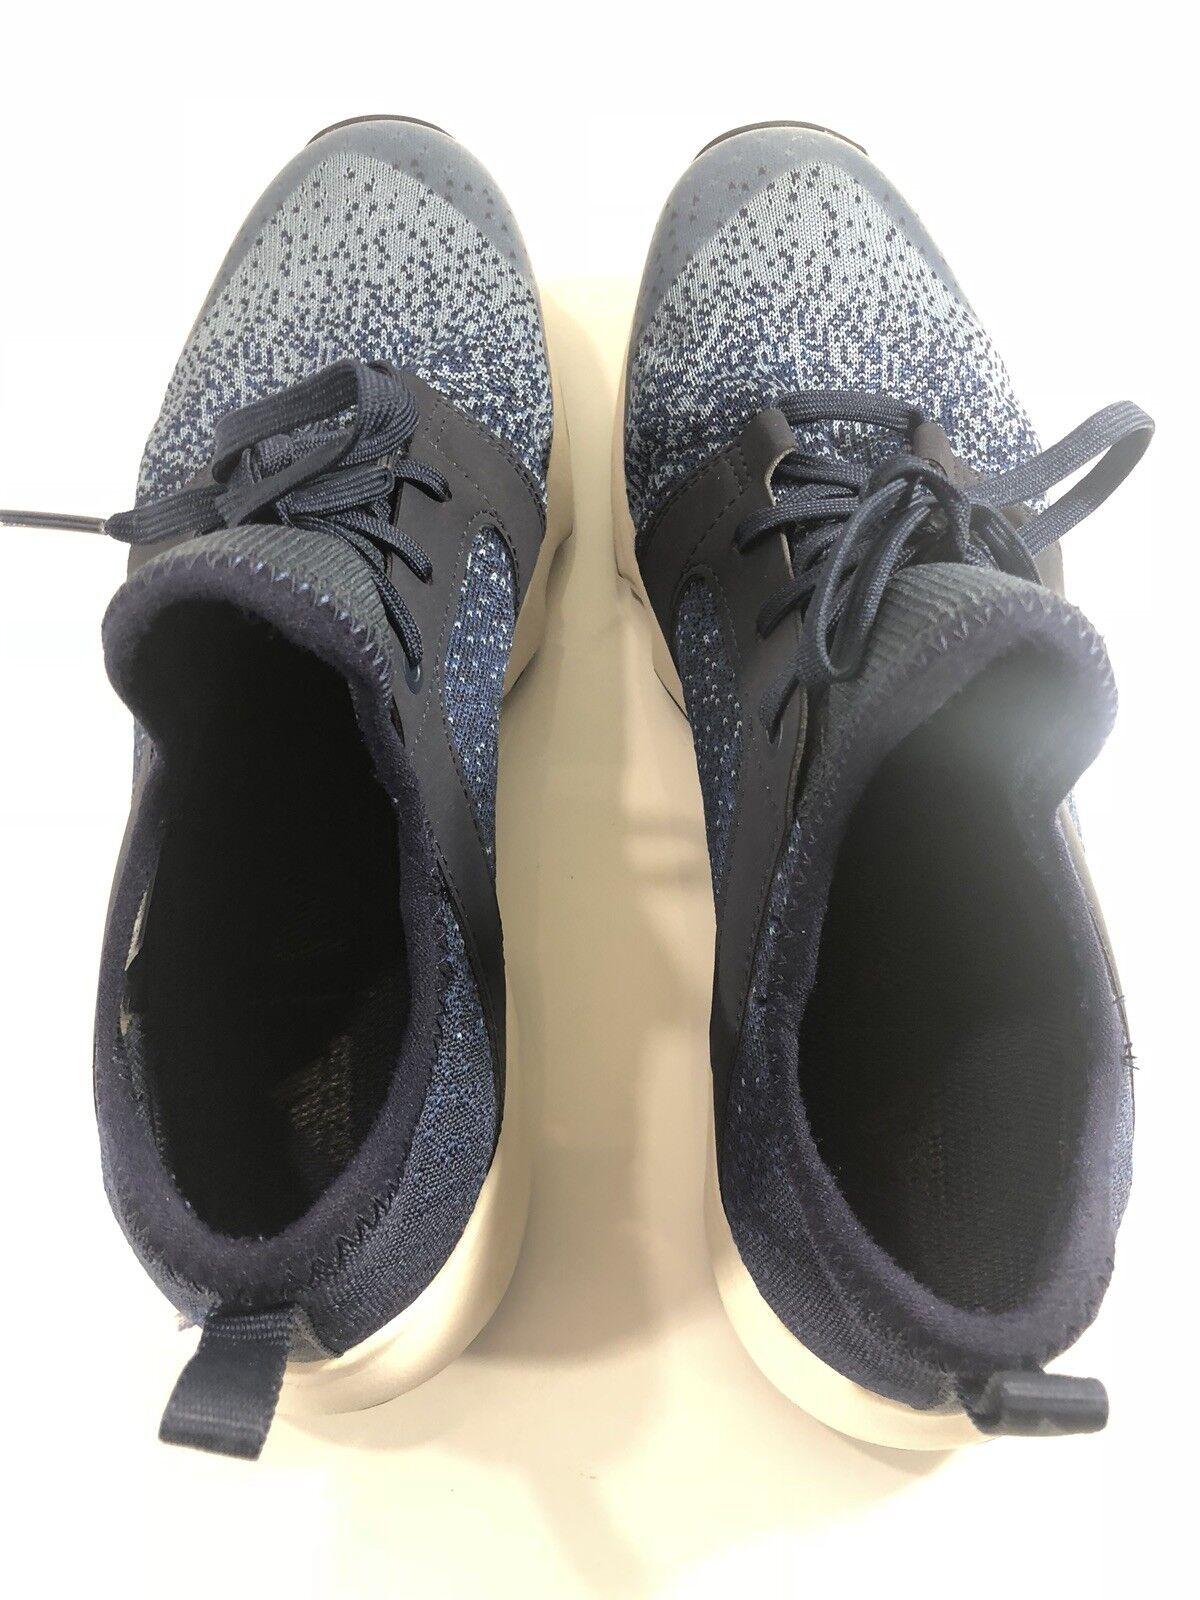 Adidas cm7545 donne terrex cc voyager elegante blu parley outdoor climacool blu elegante 8,5 e9af70